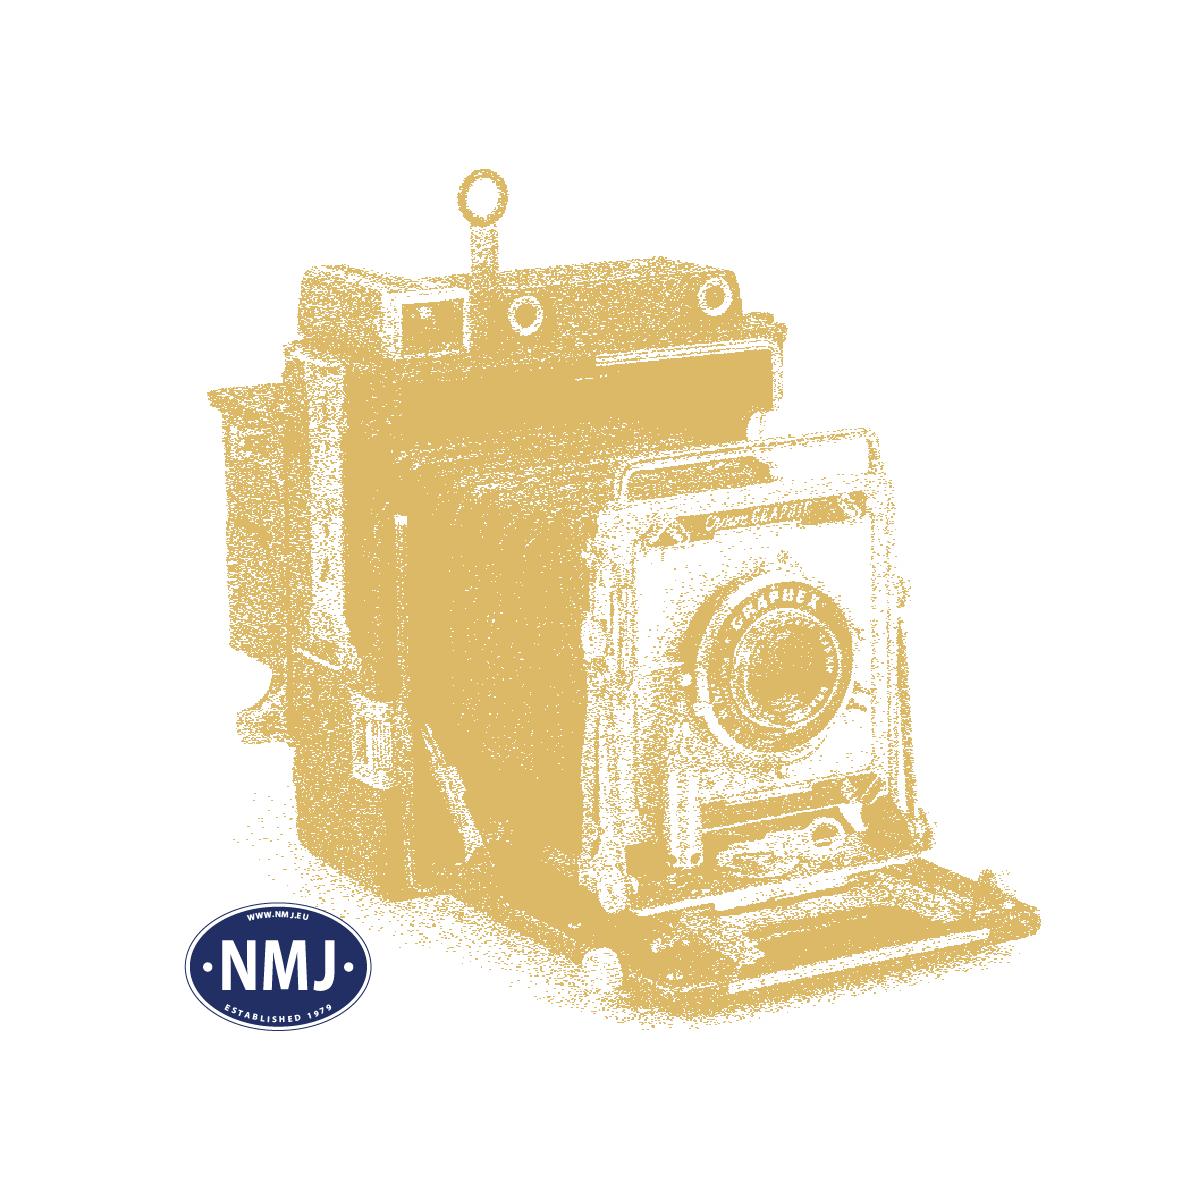 NOC58296 - Kulvert, Murpuss, 2 stk